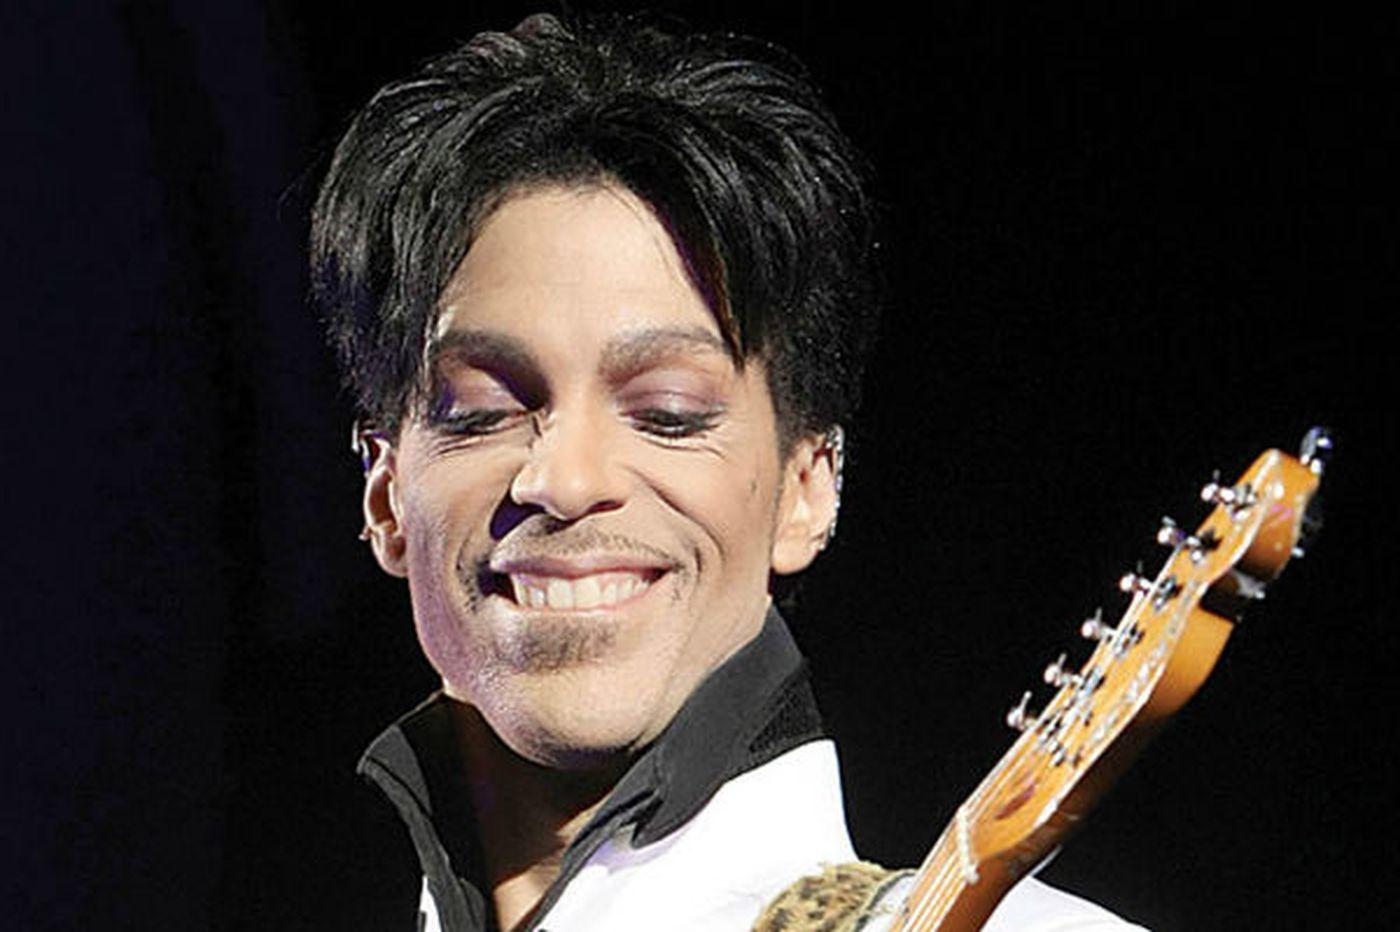 Prince sues fans, inspires controversy